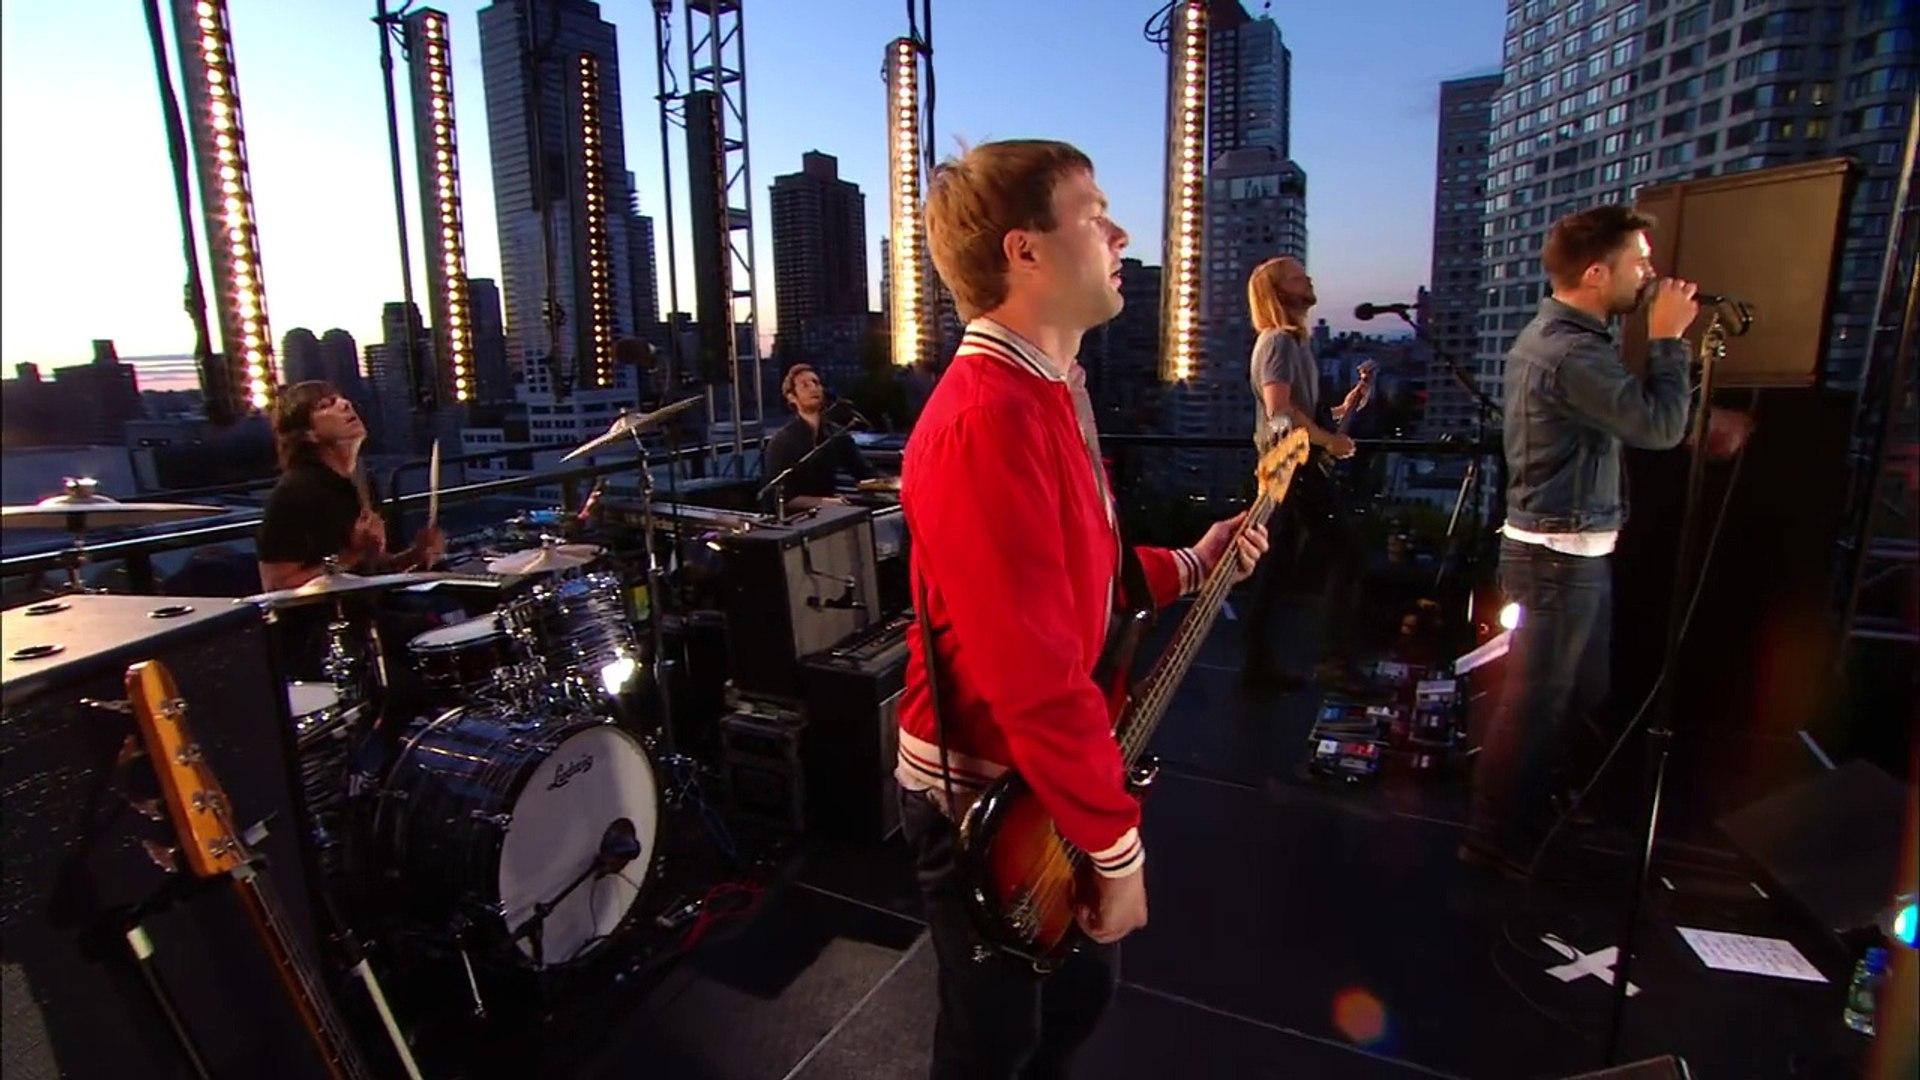 Maroon 5 - Harder To Breathe (VEVO Summer Sets)